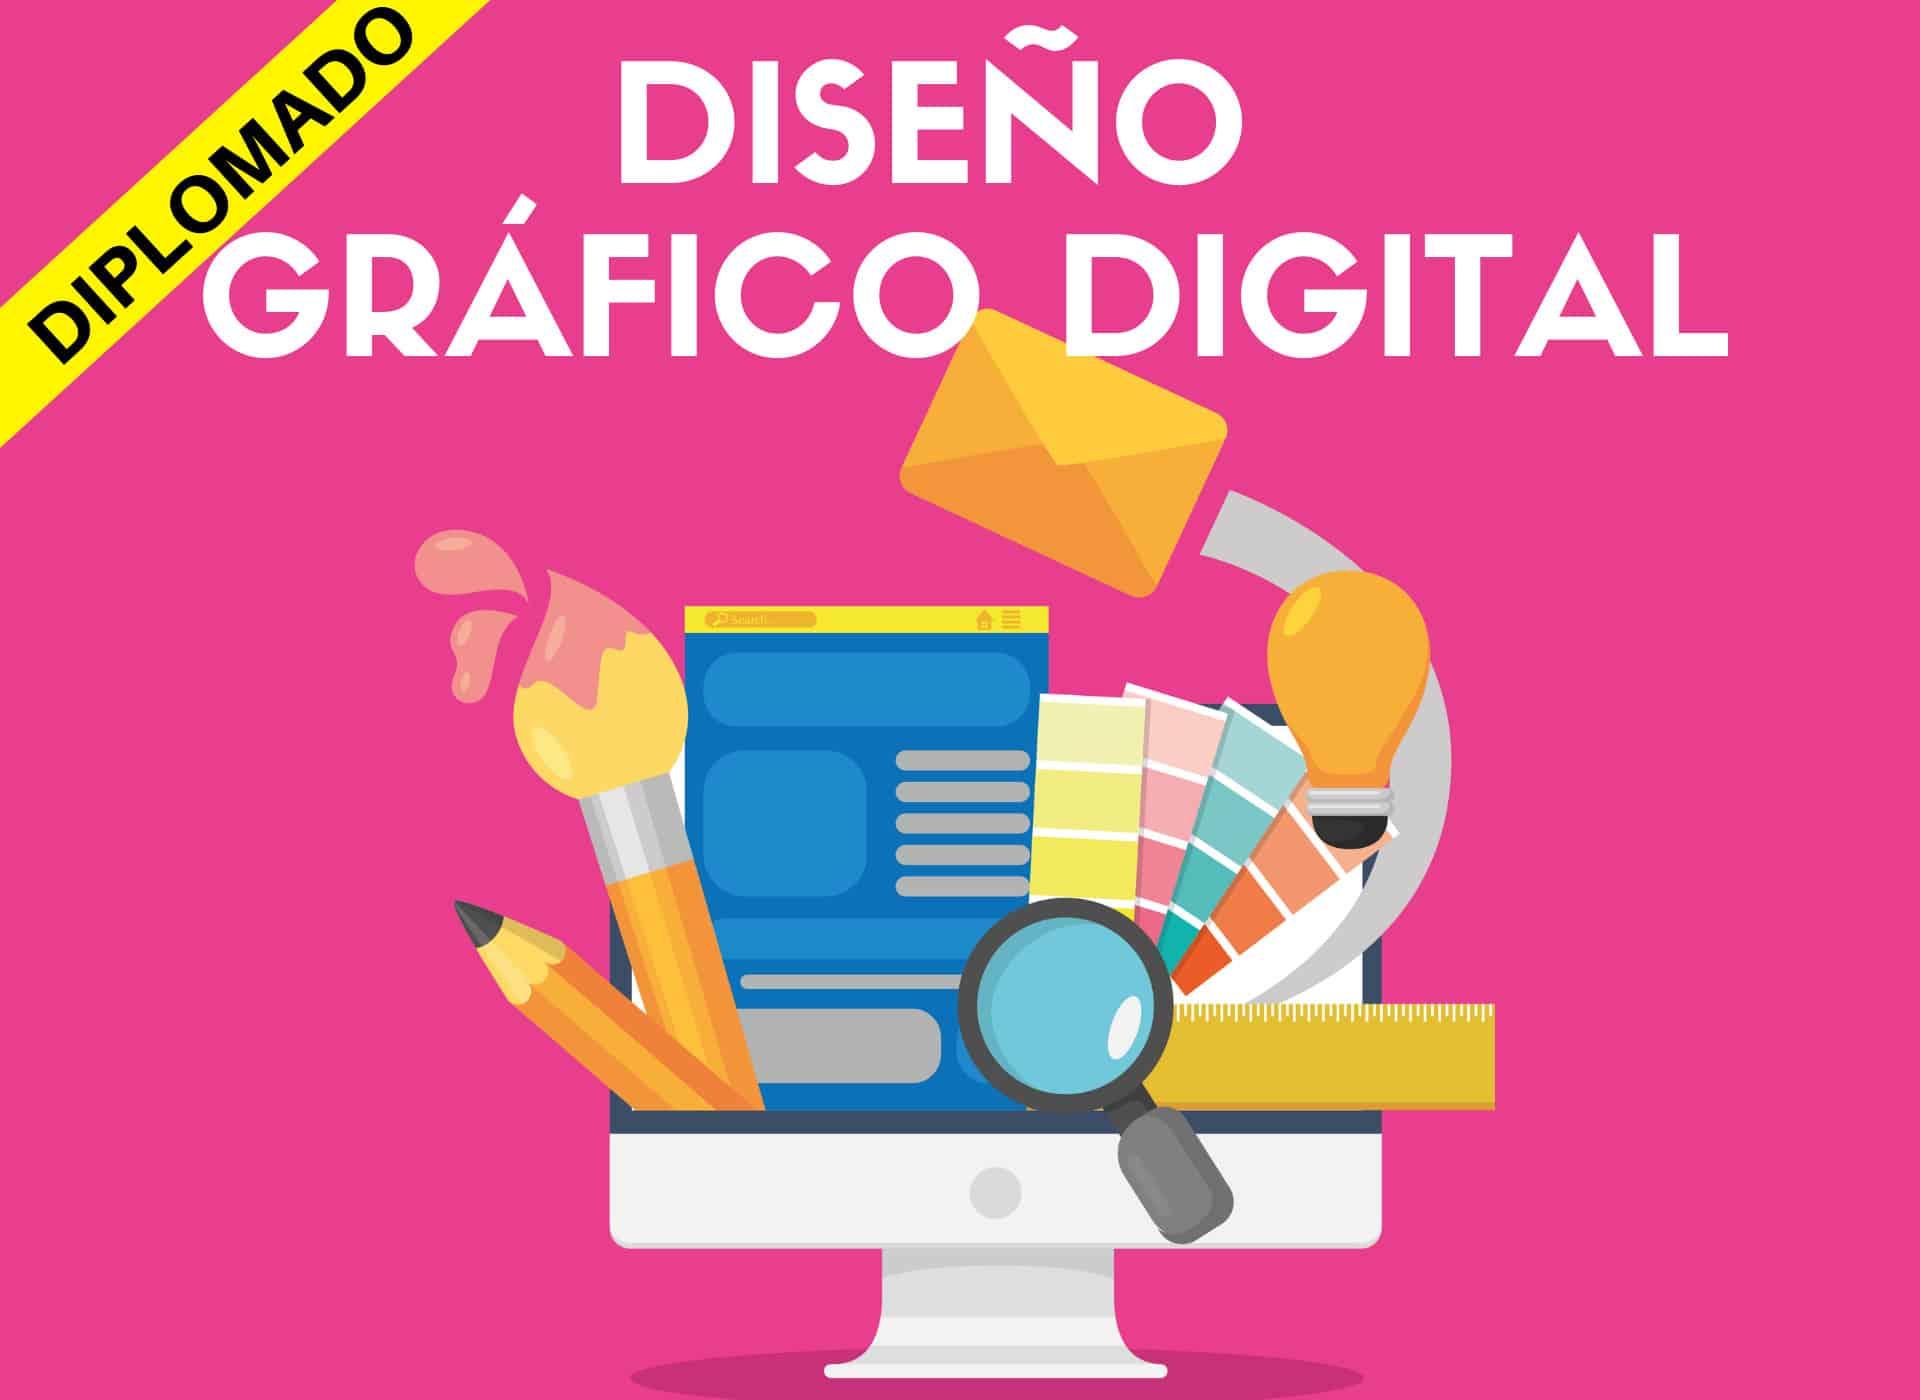 Diplomado en Diseño gráfico digital profesional